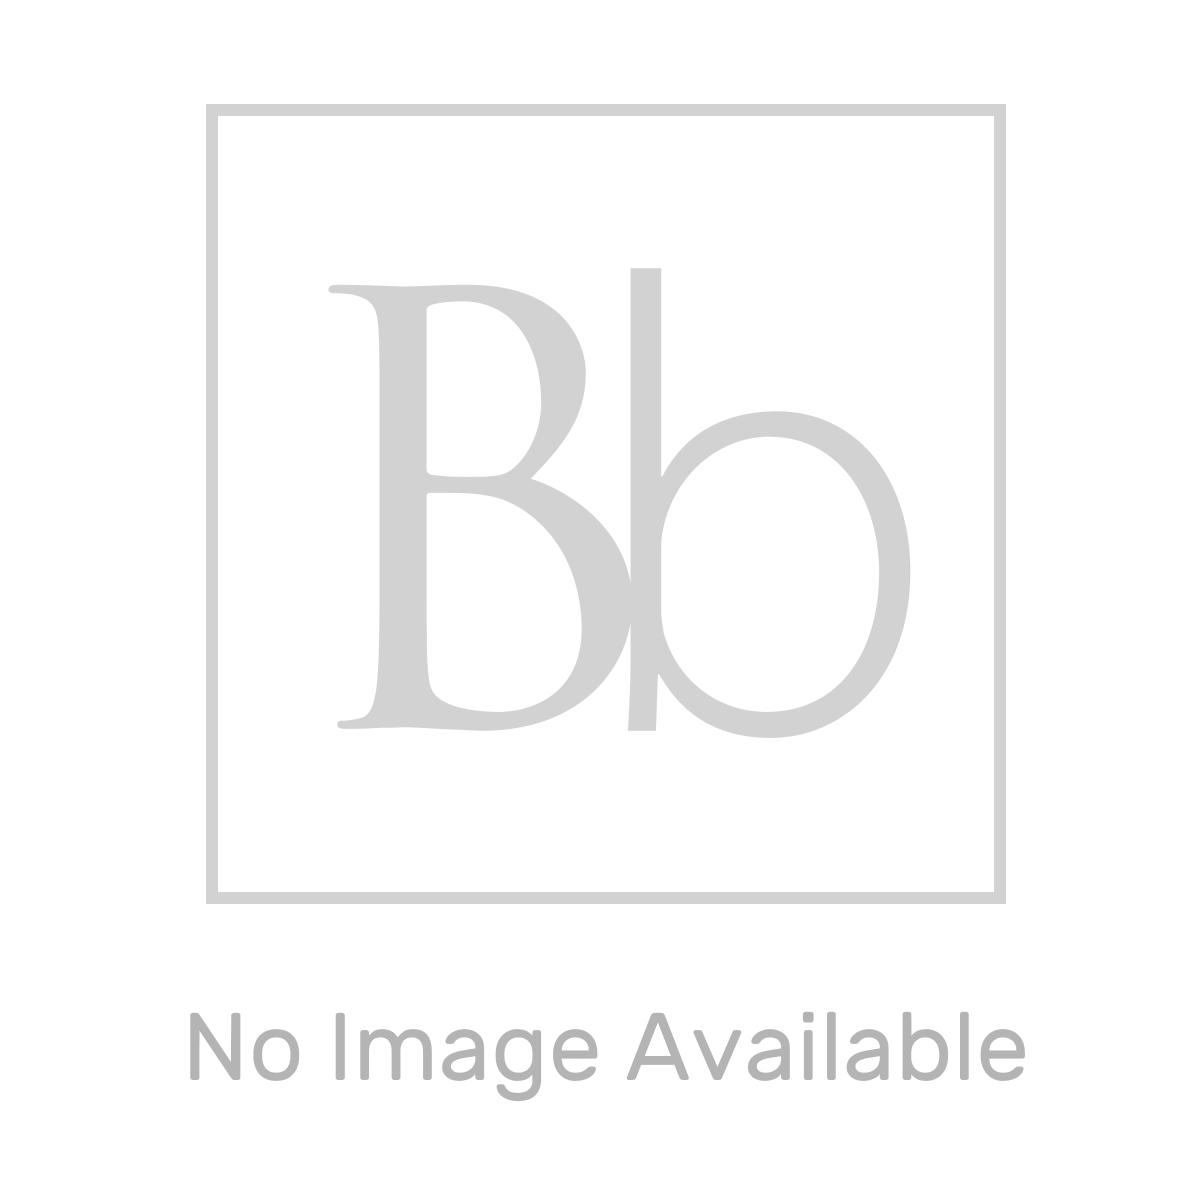 Moods Tudor Gloss White Acrylic Bath Front Panel 1700mm